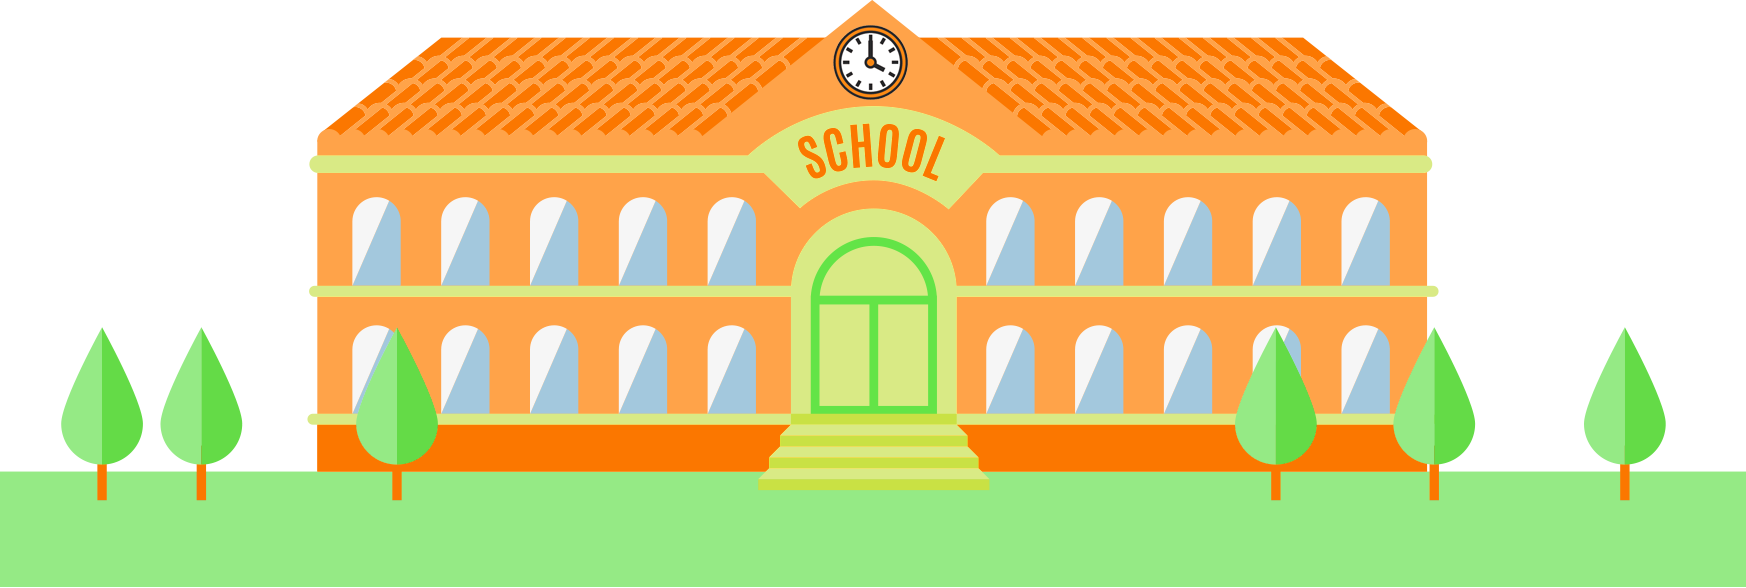 School PNG Transparent Images.